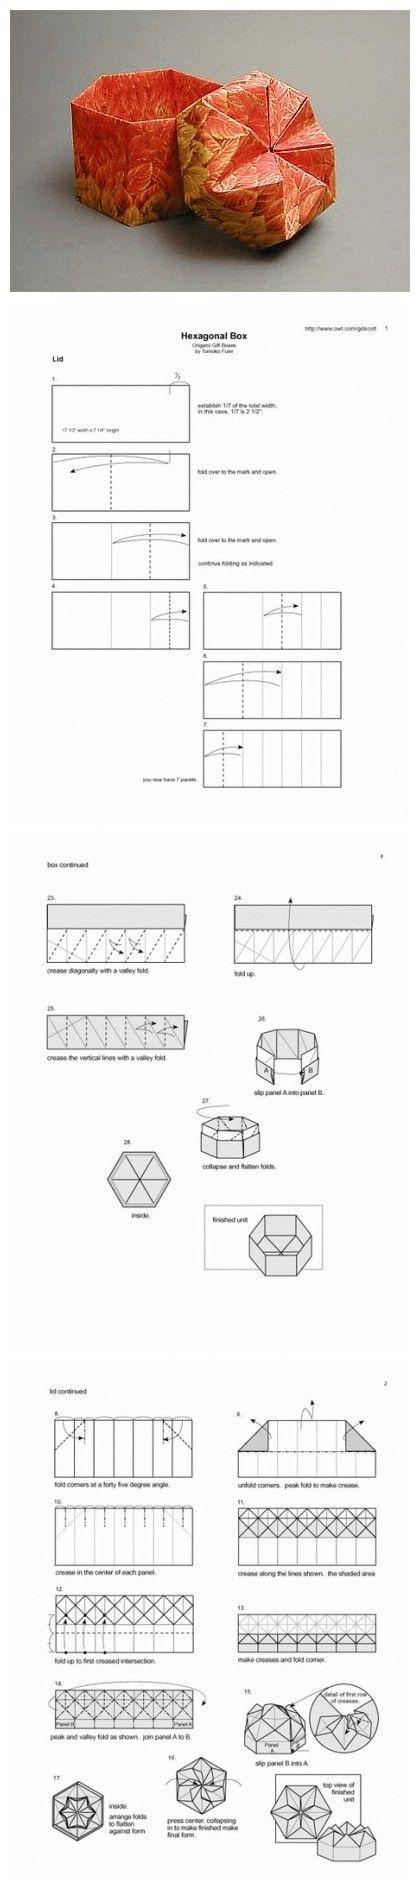 Origami Hexagonal Box Folding Instructions | Origami Instruction